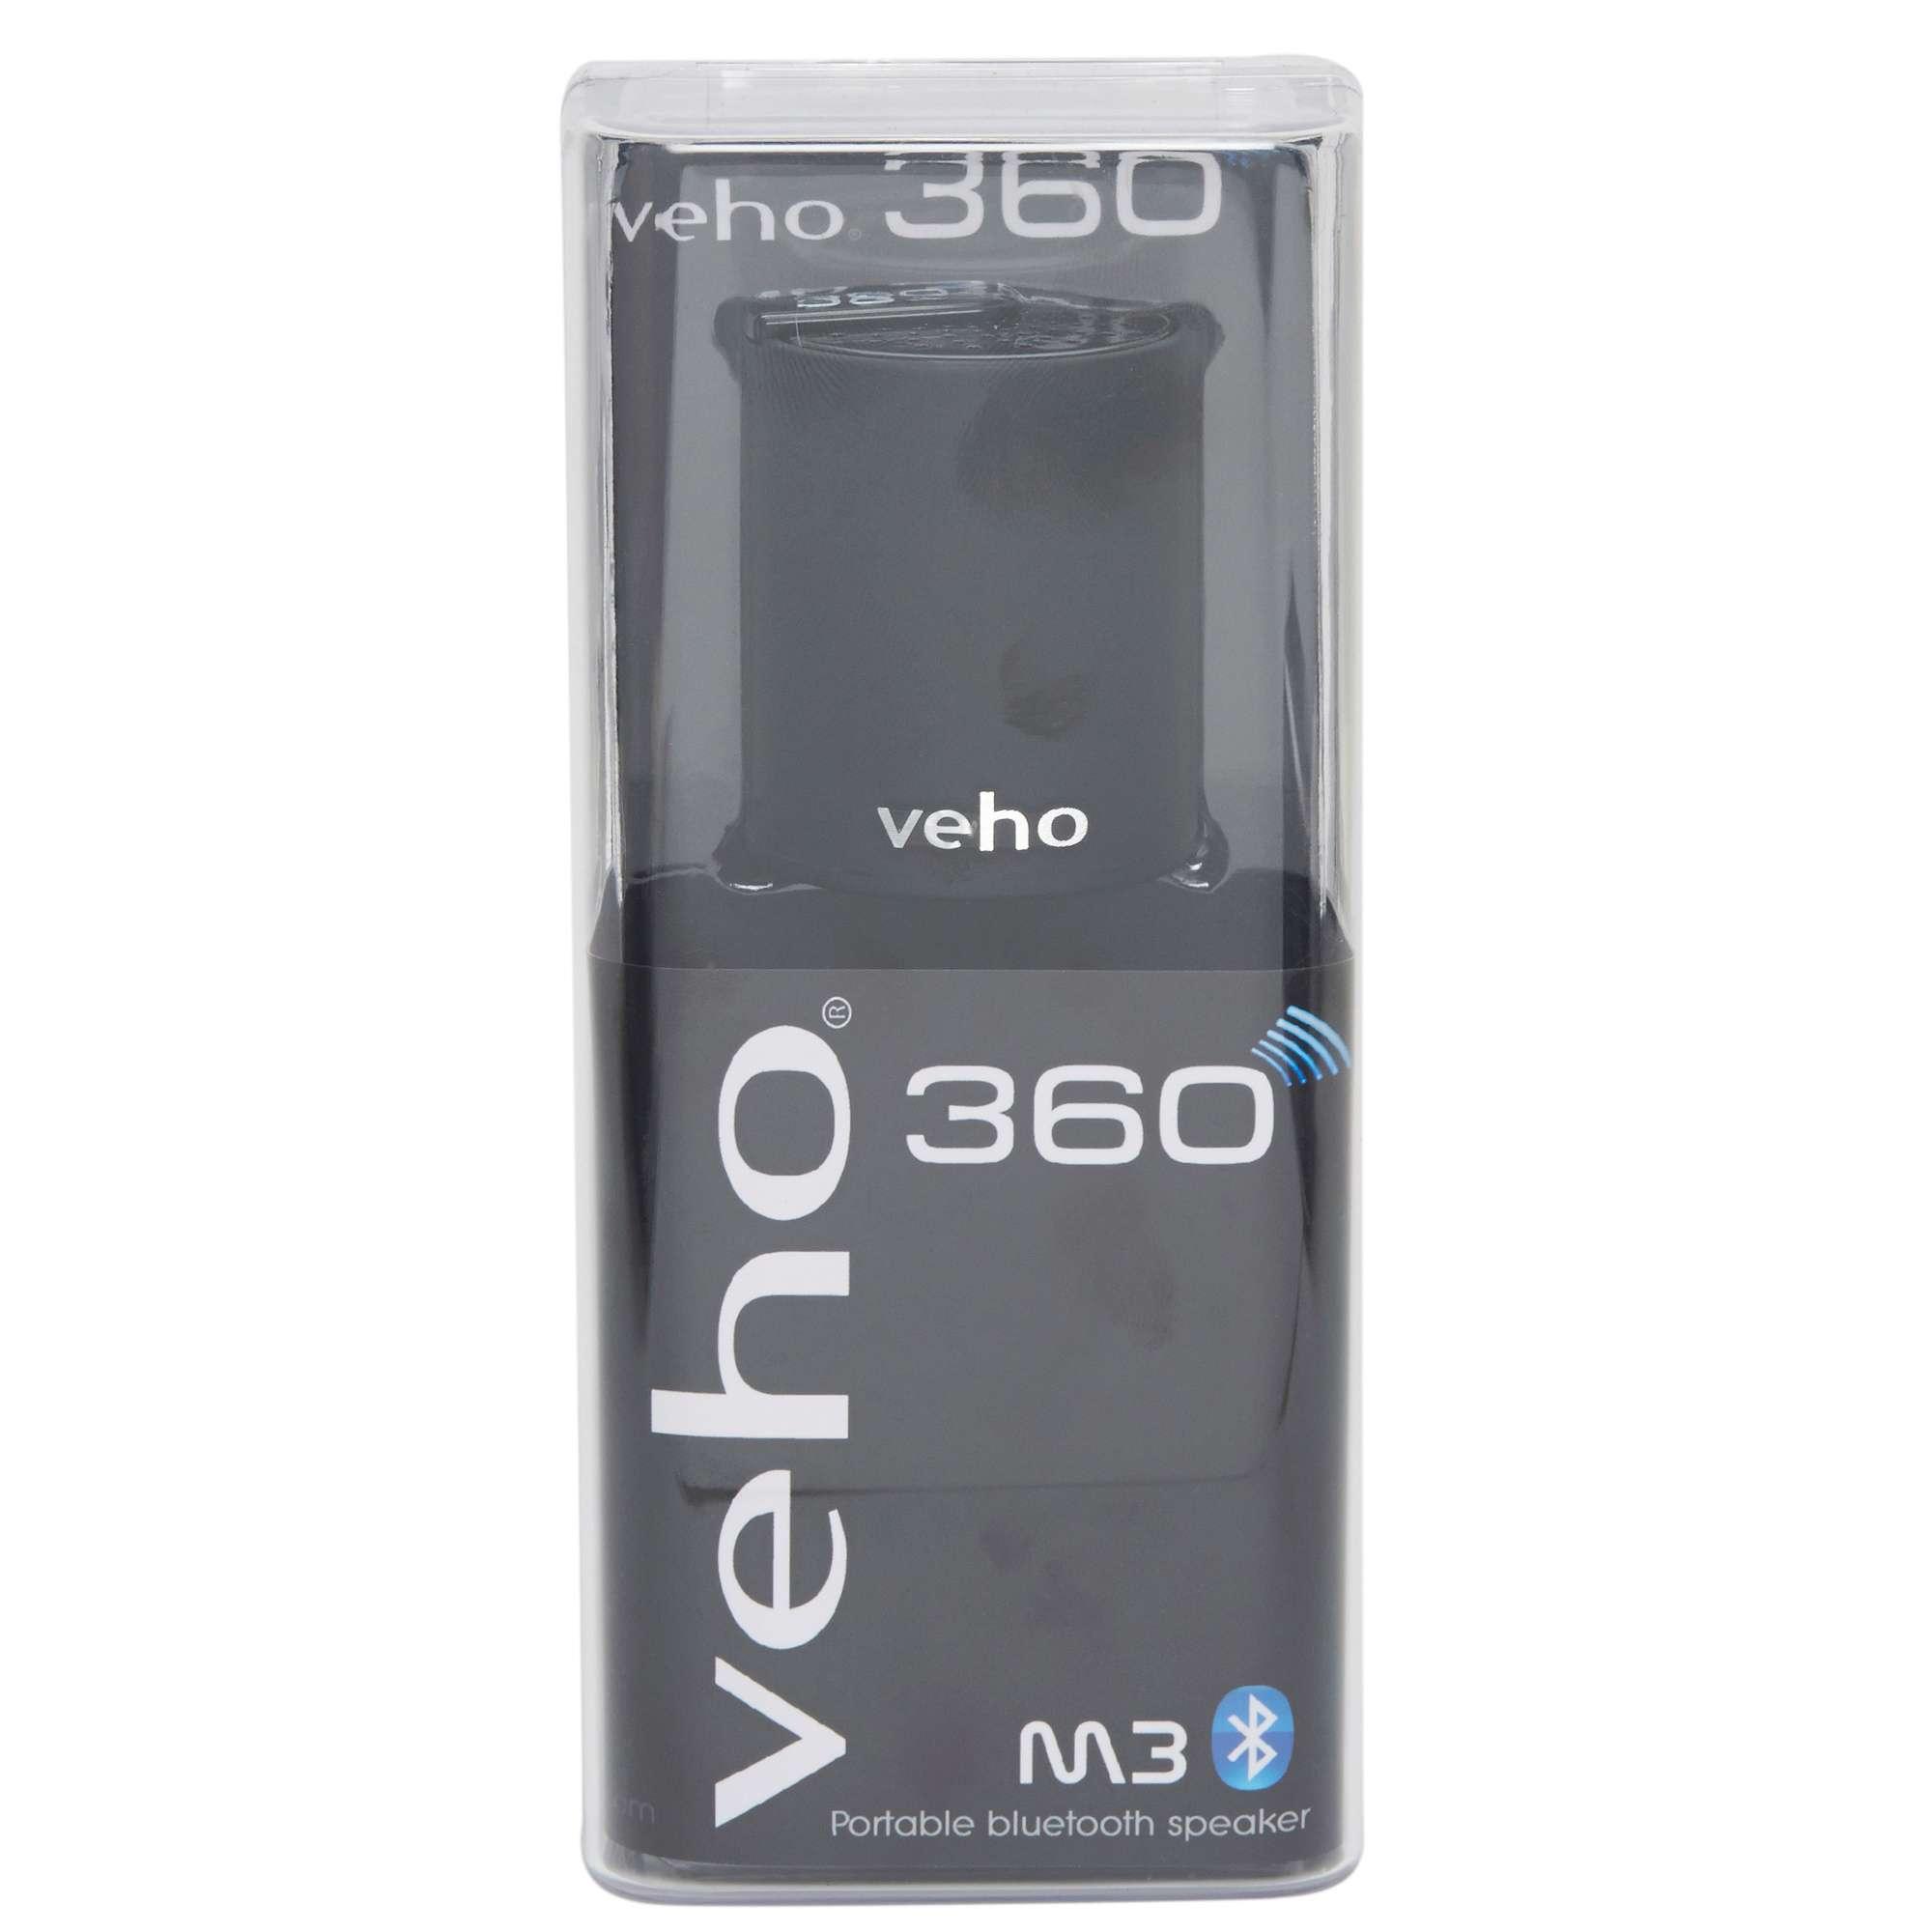 VEHO 360° M3 Portable Bluetooth Wireless Speaker